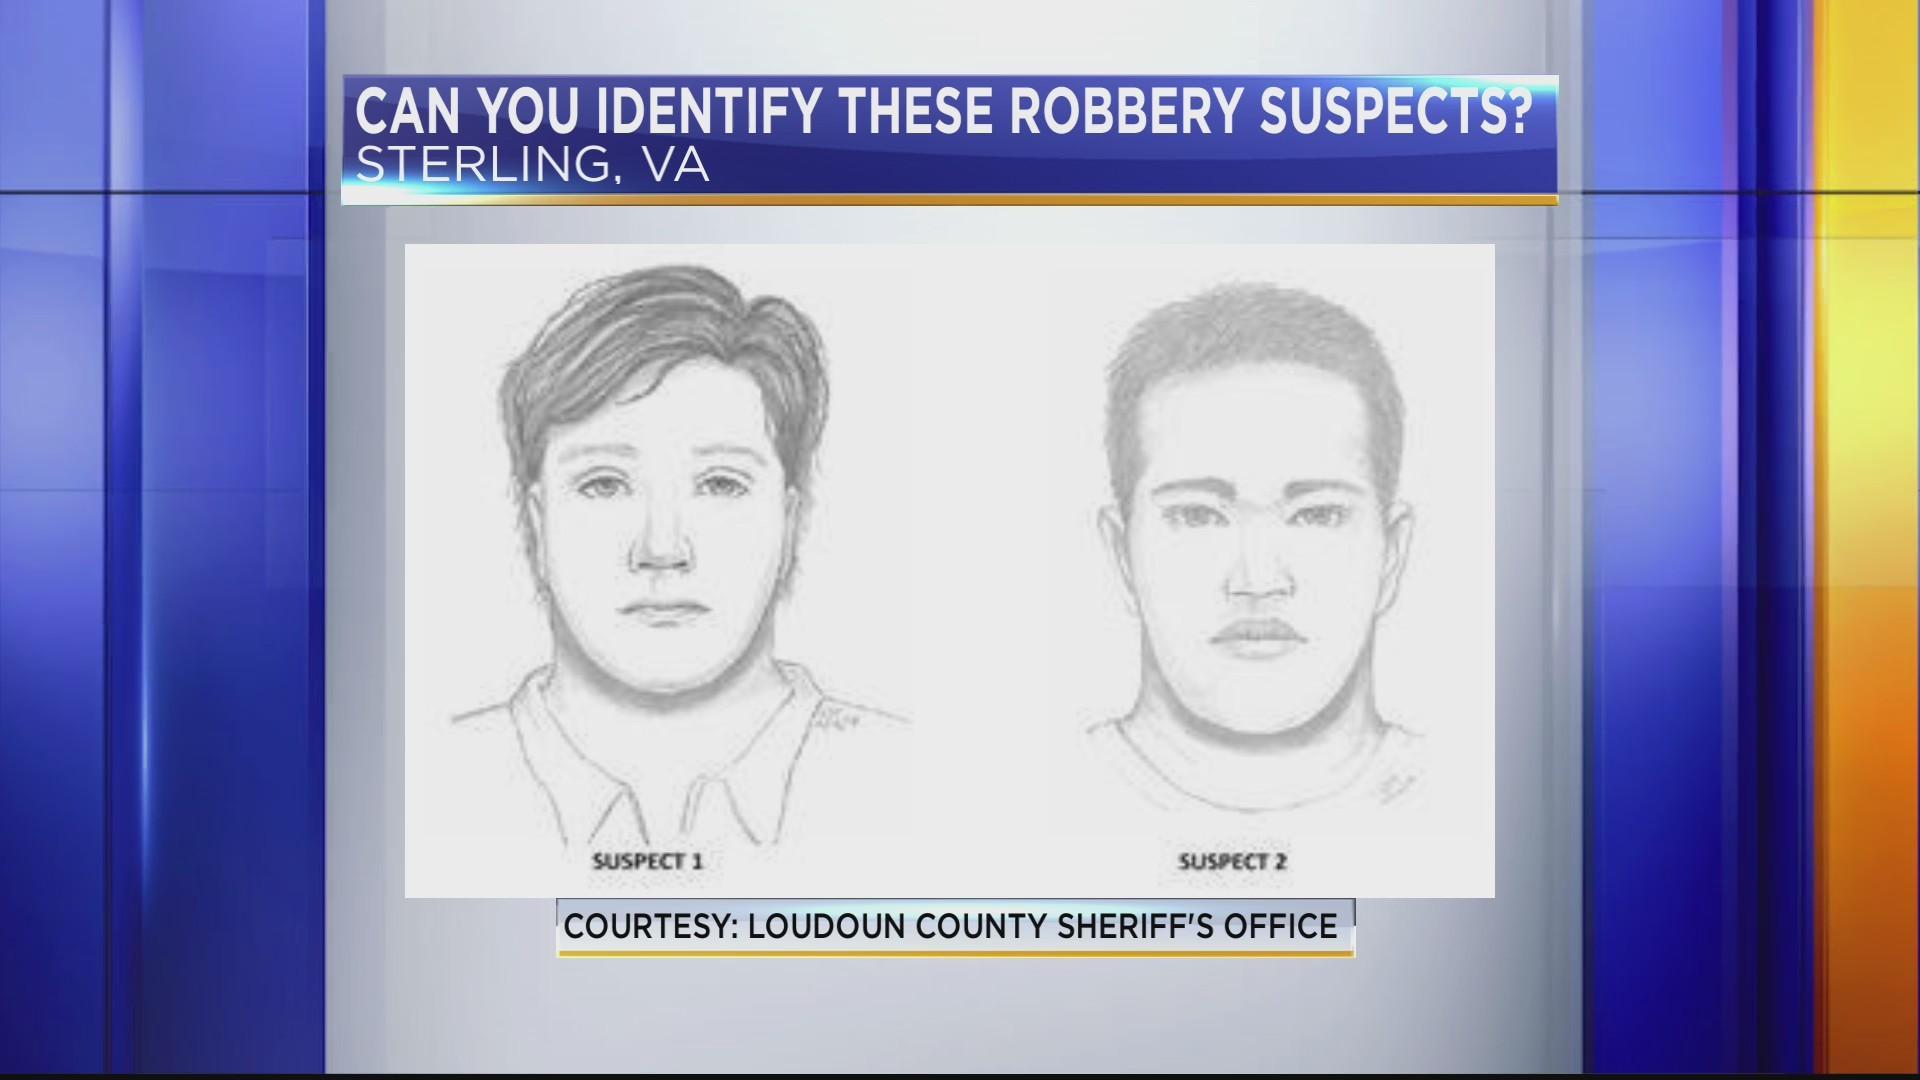 LOCO_robbery_0_20181018021442